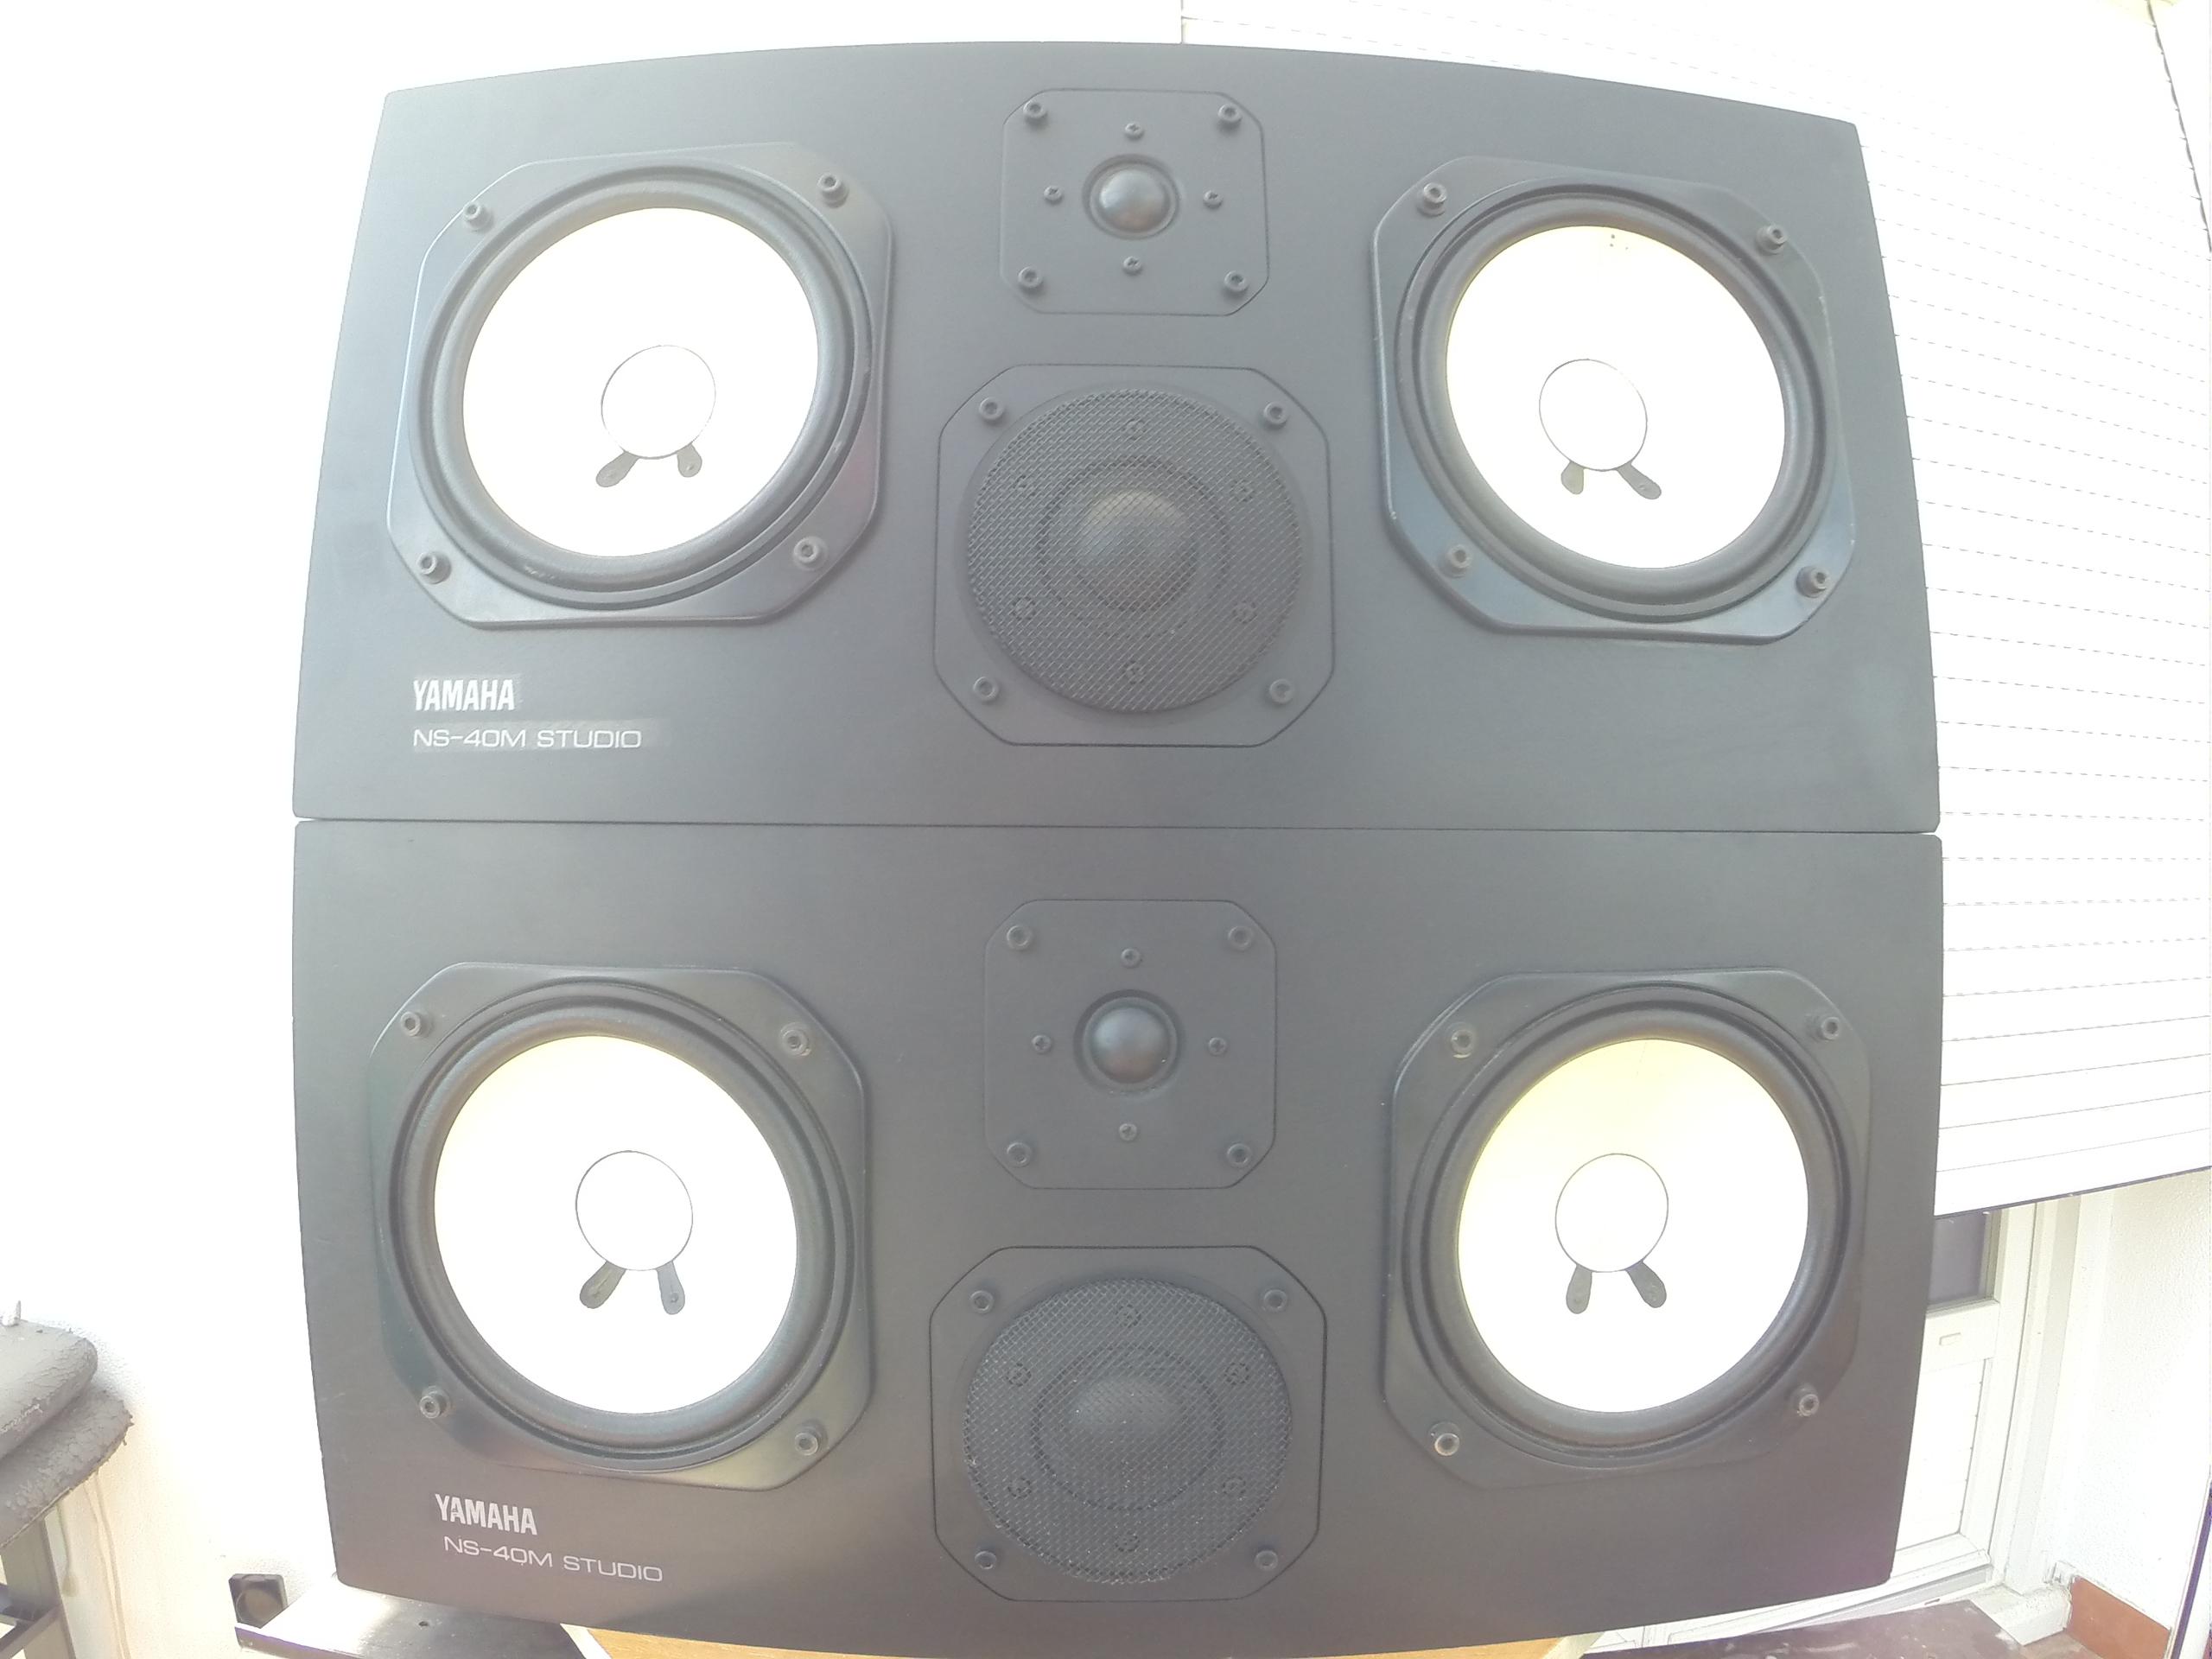 Ns 40m studio yamaha ns 40m studio audiofanzine for Yamaha ns 40